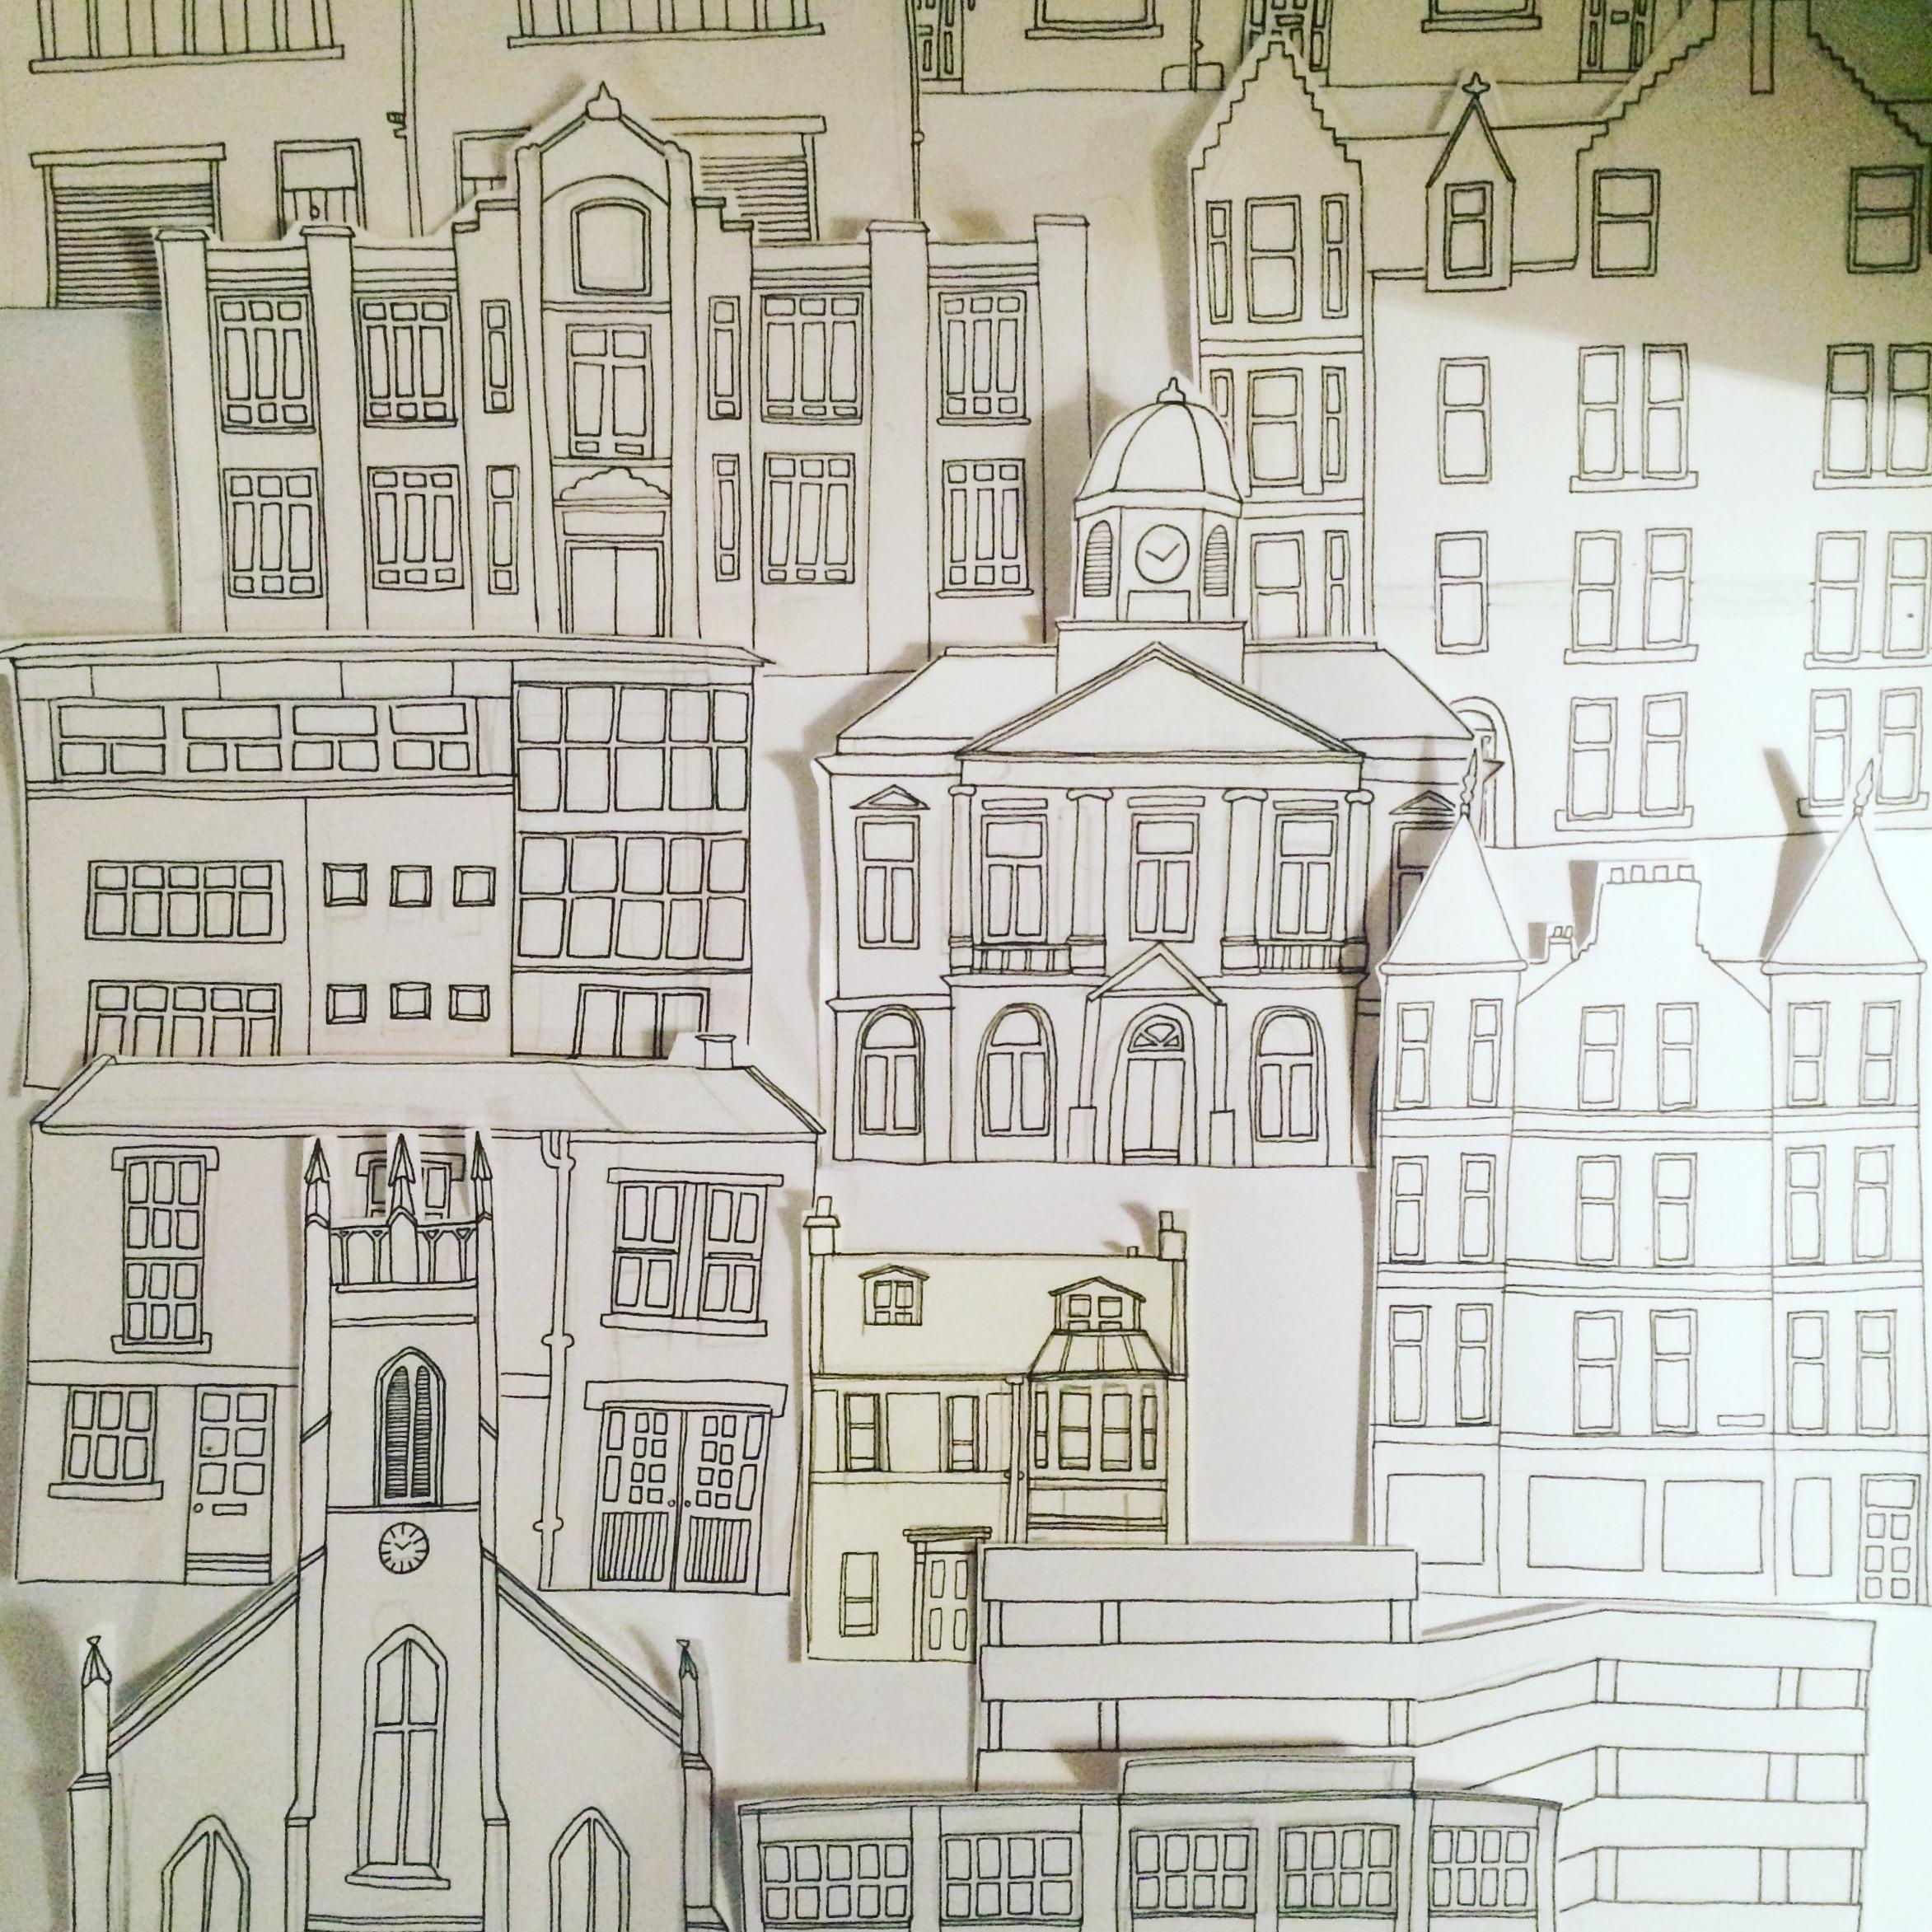 Edinburgh doodles